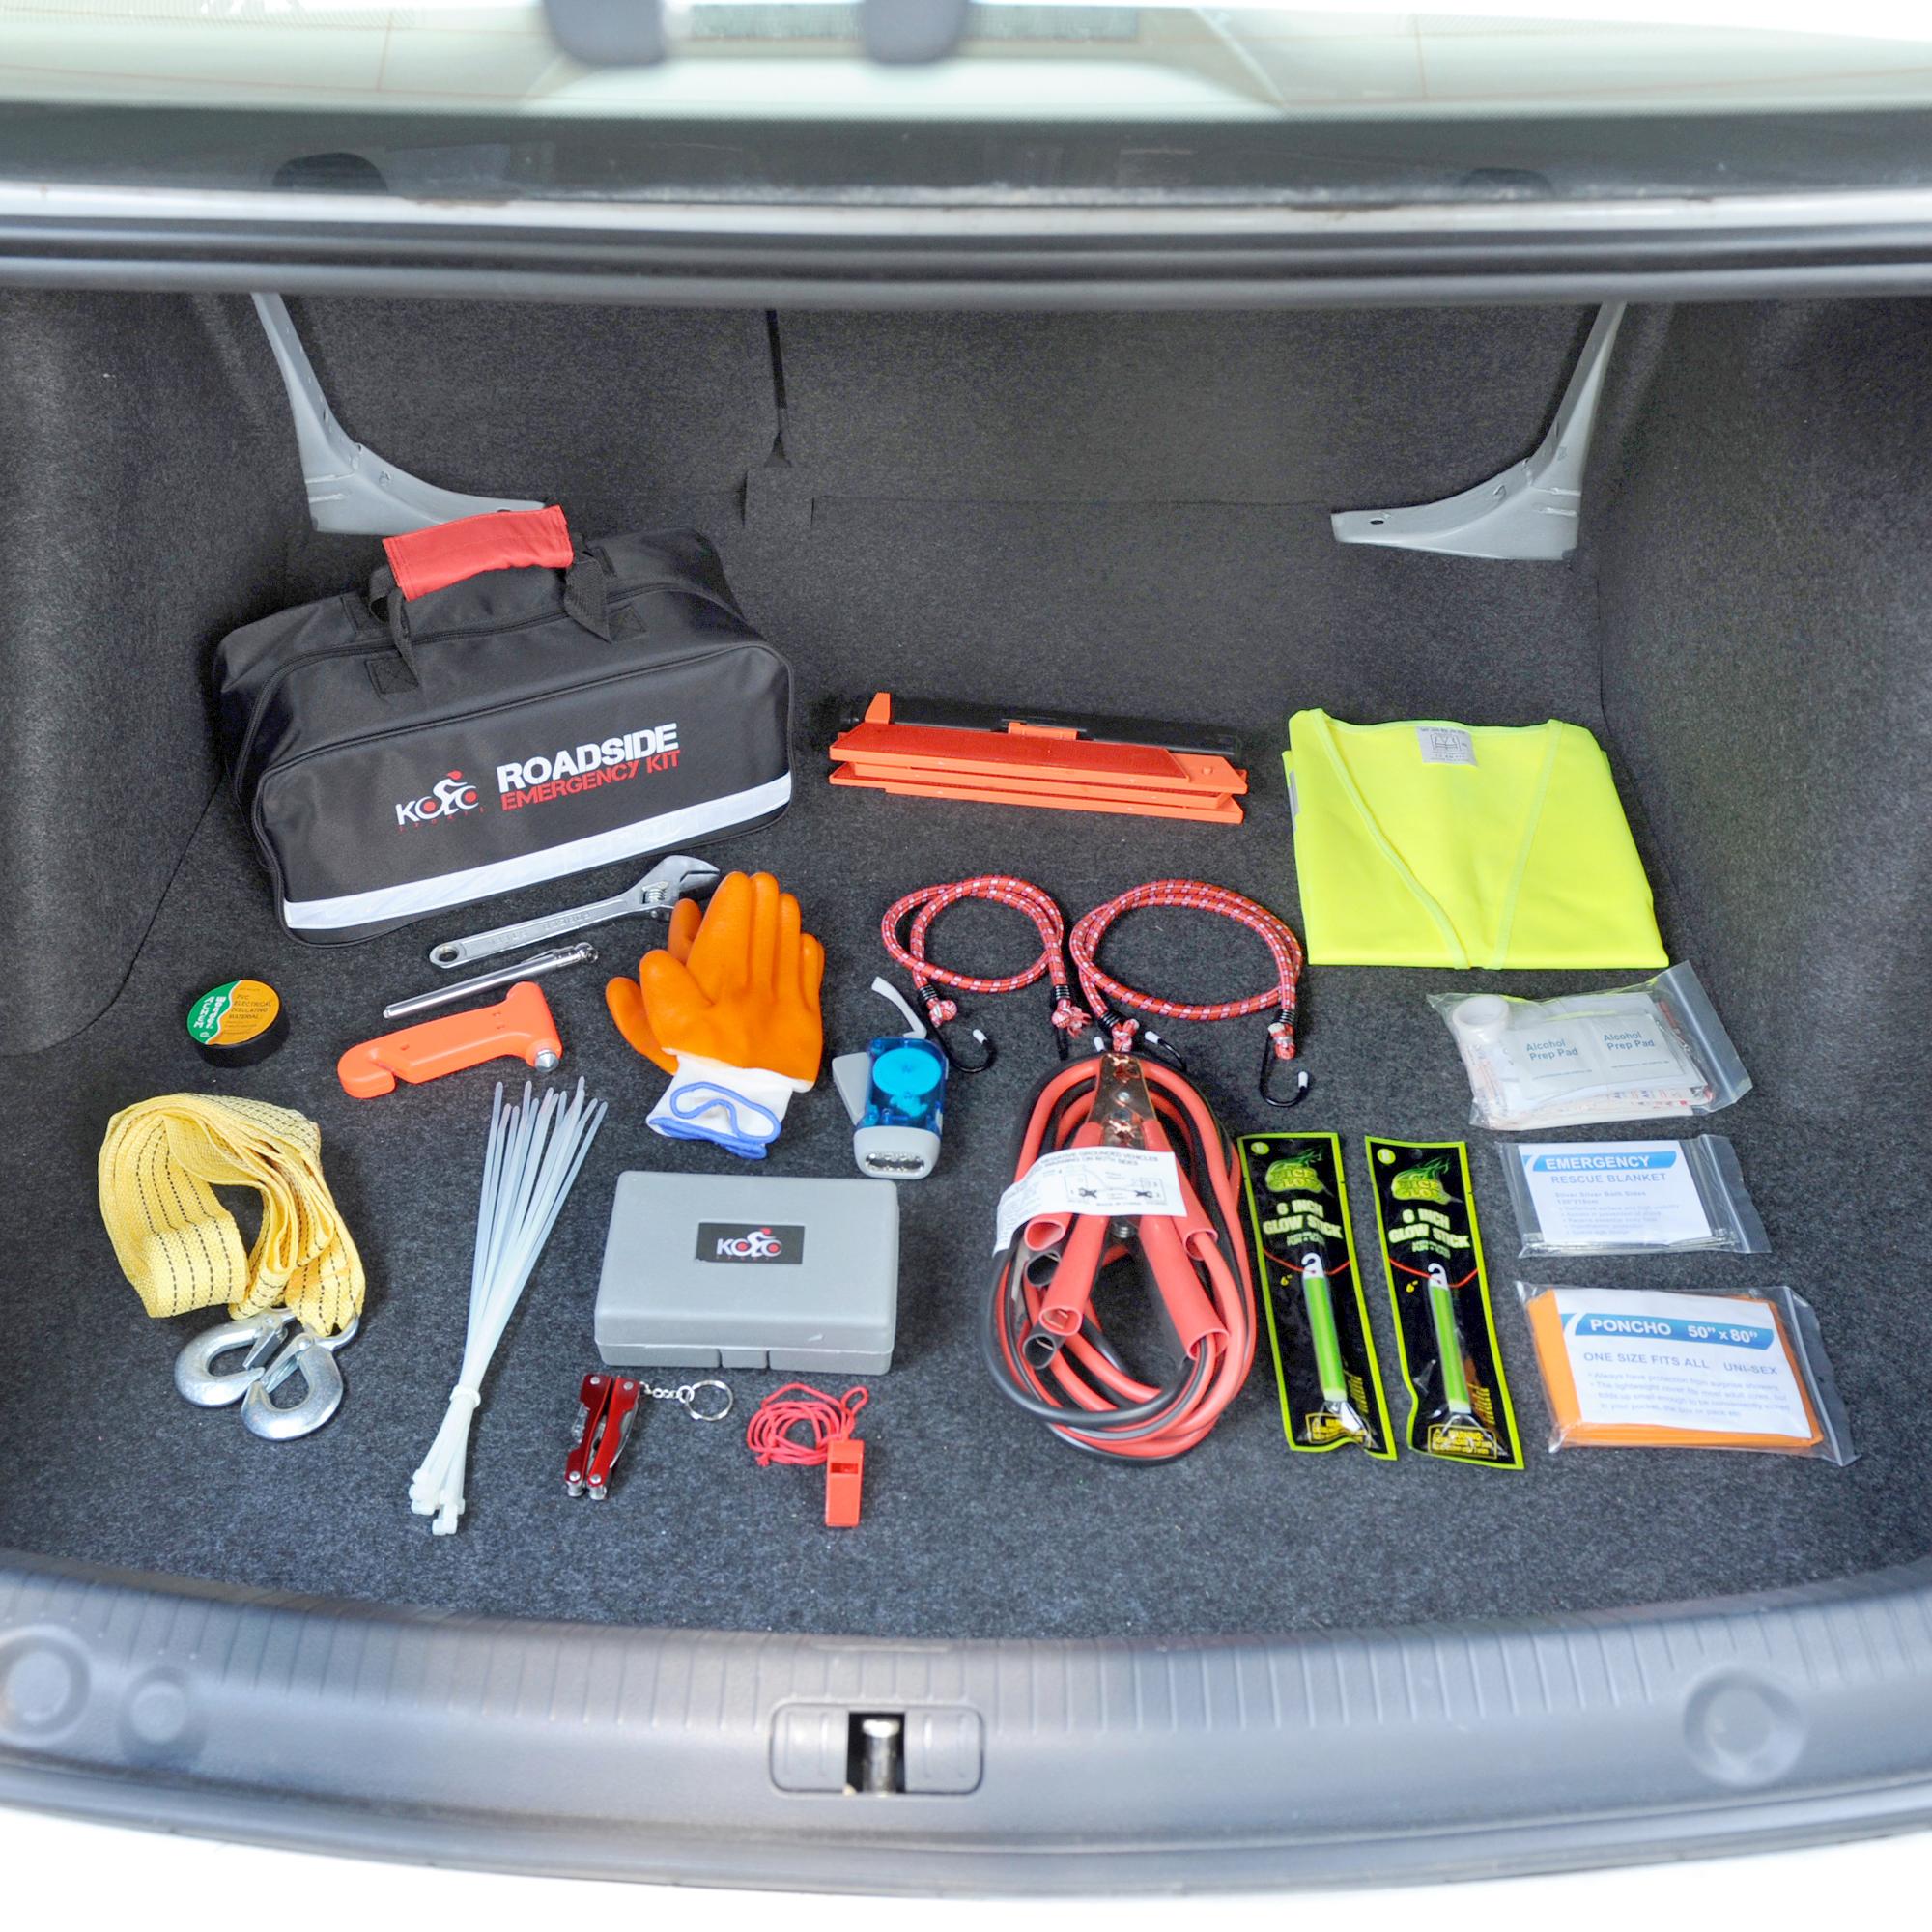 Kit Cars To Build Yourself In Usa: Premium Auto Emergency Kit By Kolosports